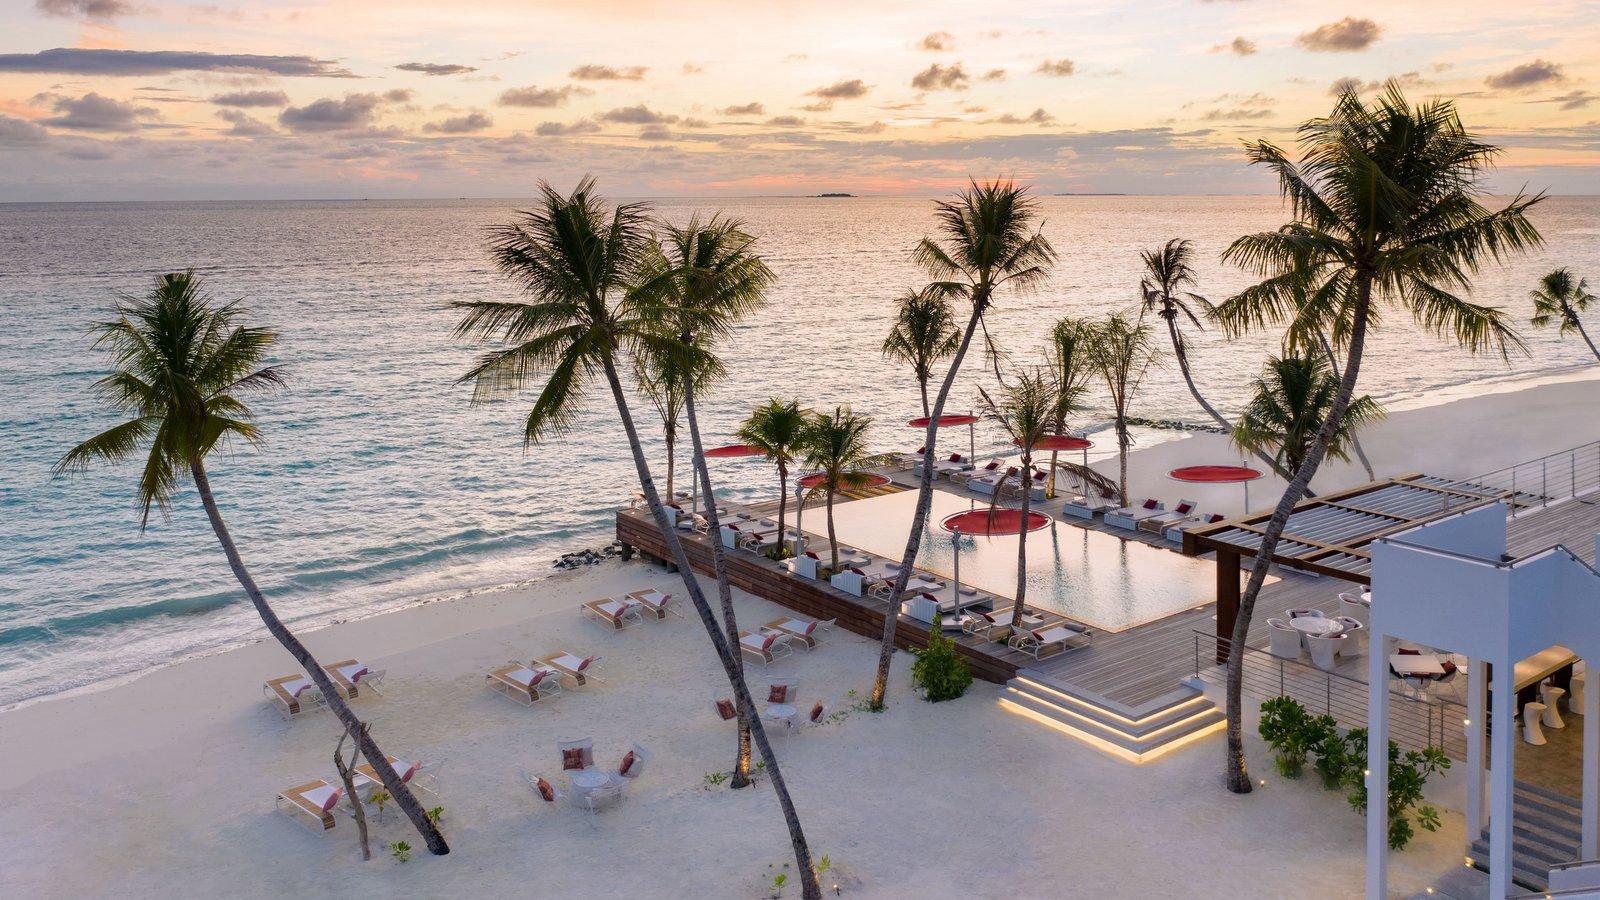 Мальдивы, отель LUX North Male Atoll, ресторан Beach Rouge